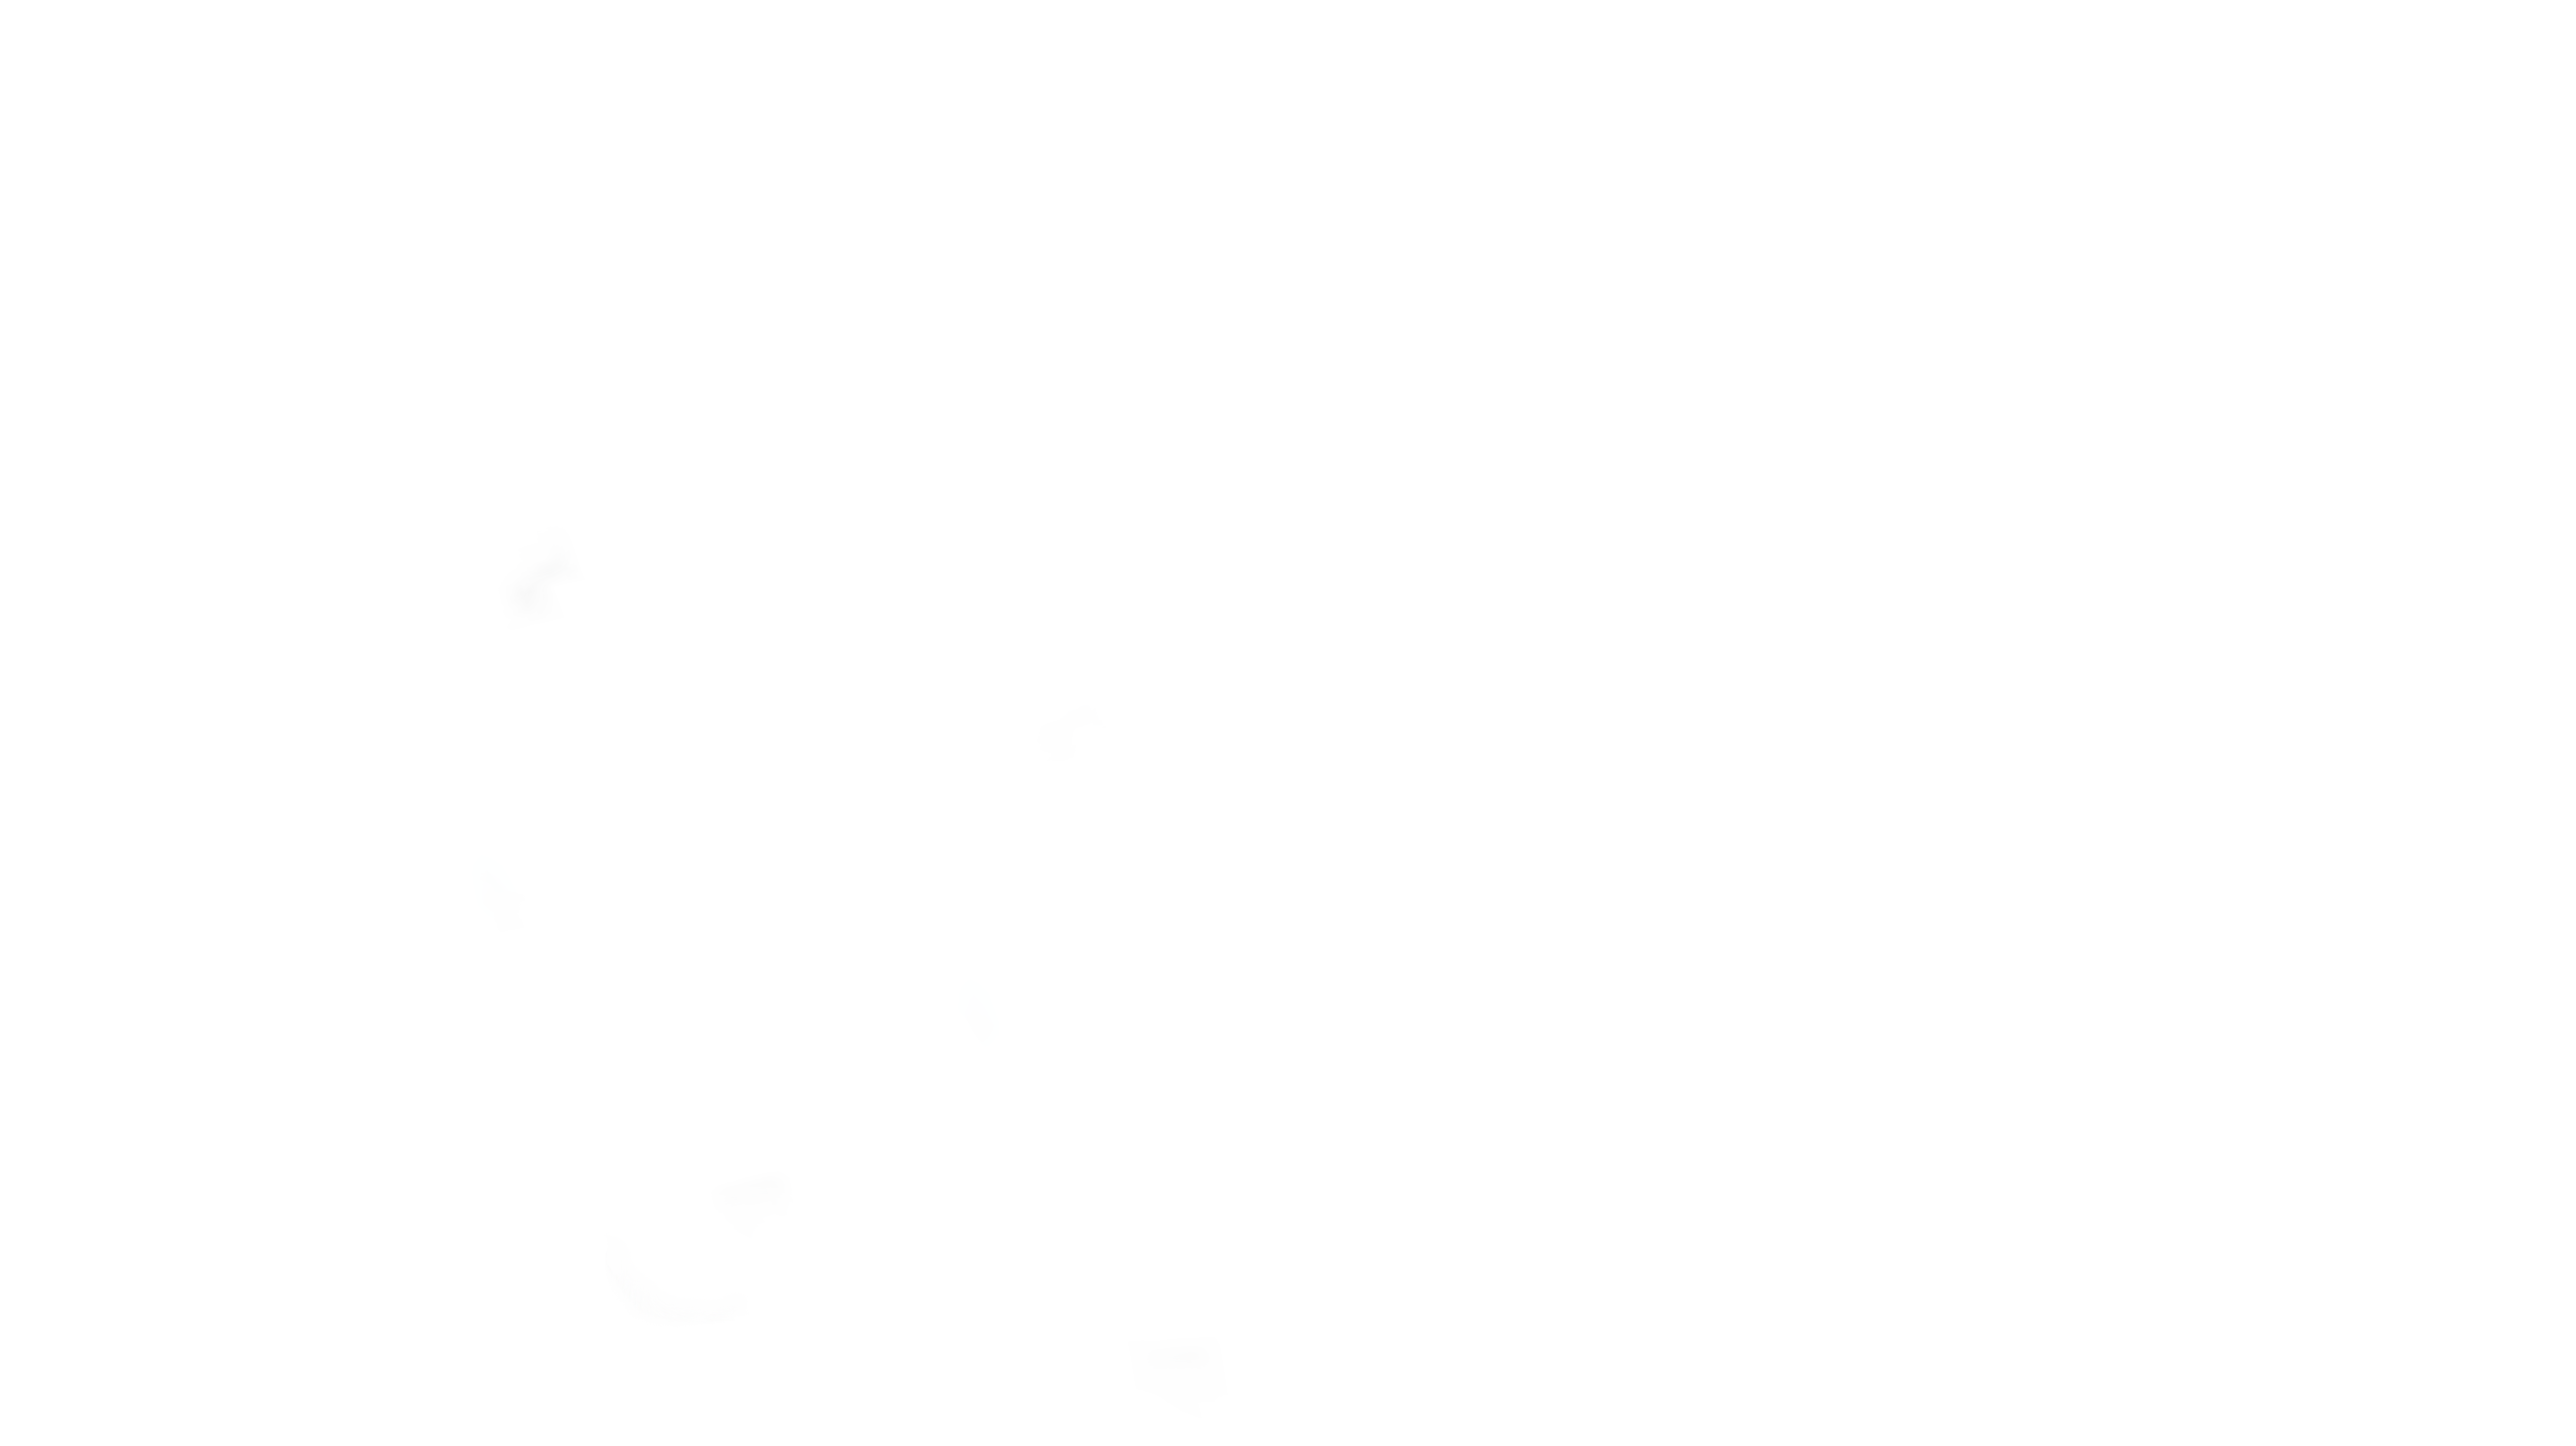 Realistic Cloud PNG Transparent Clip Art Image.